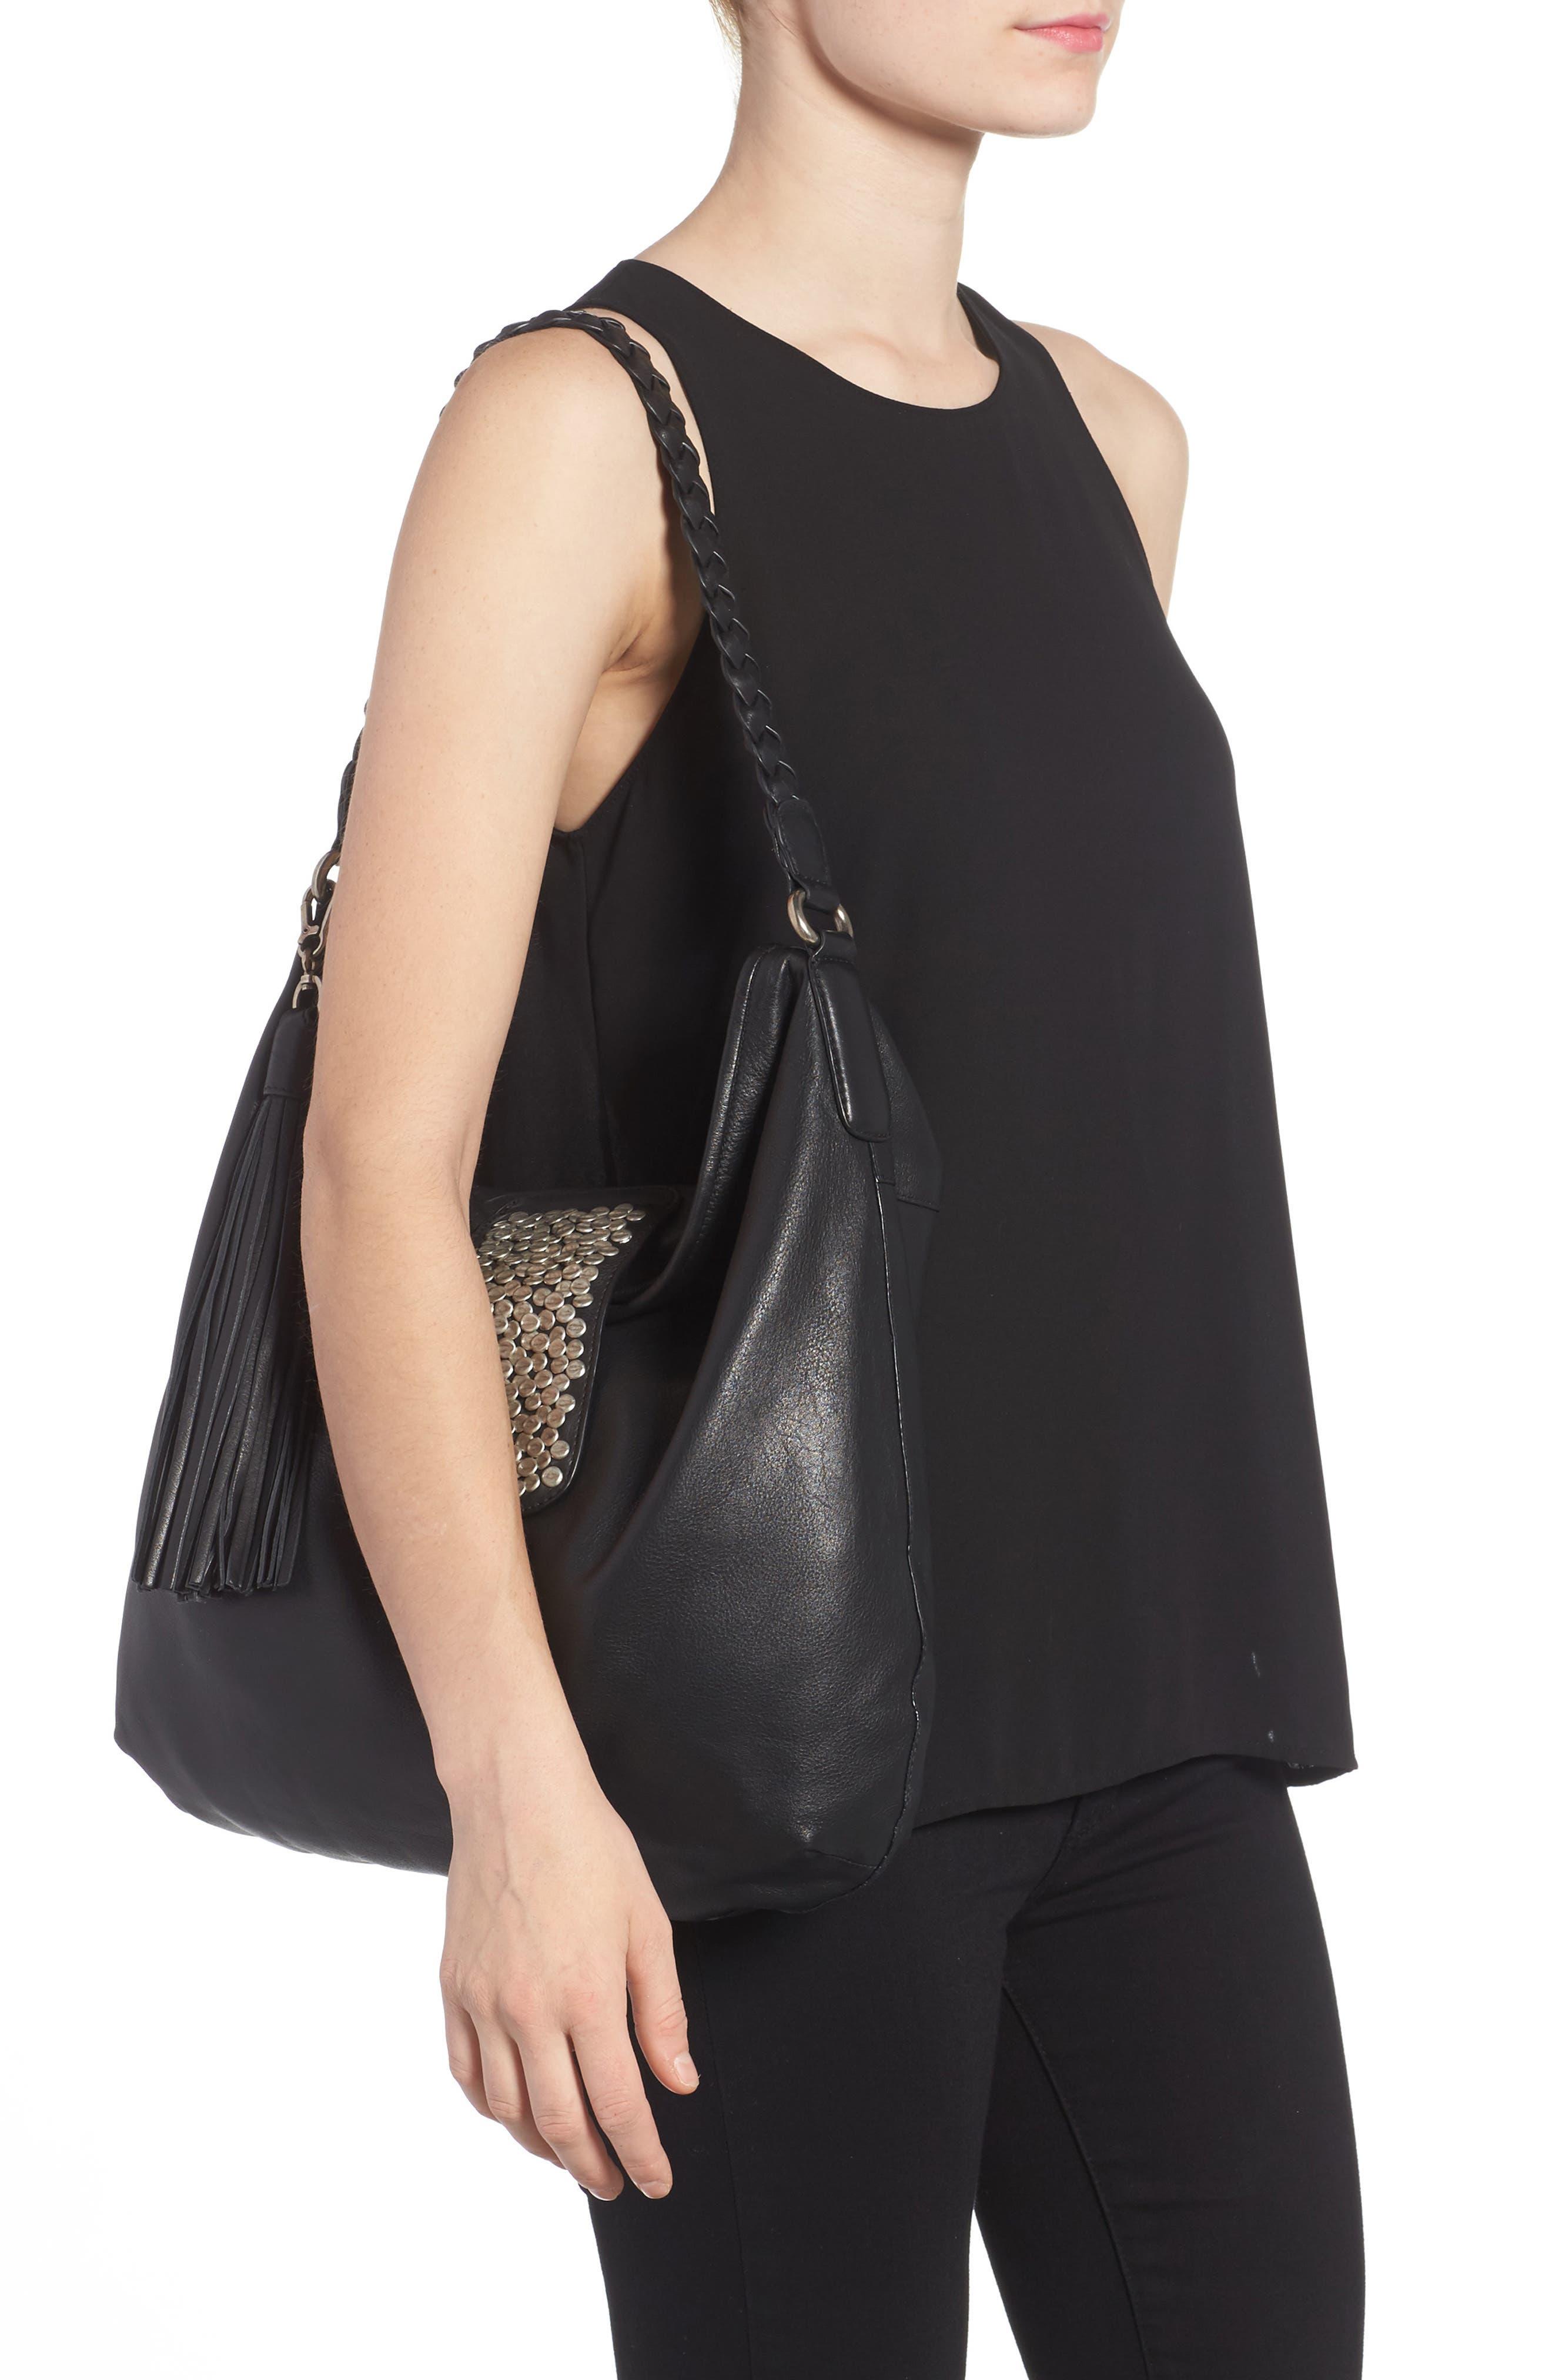 Céline Dion Cadence Leather Hobo Bag,                             Alternate thumbnail 2, color,                             001